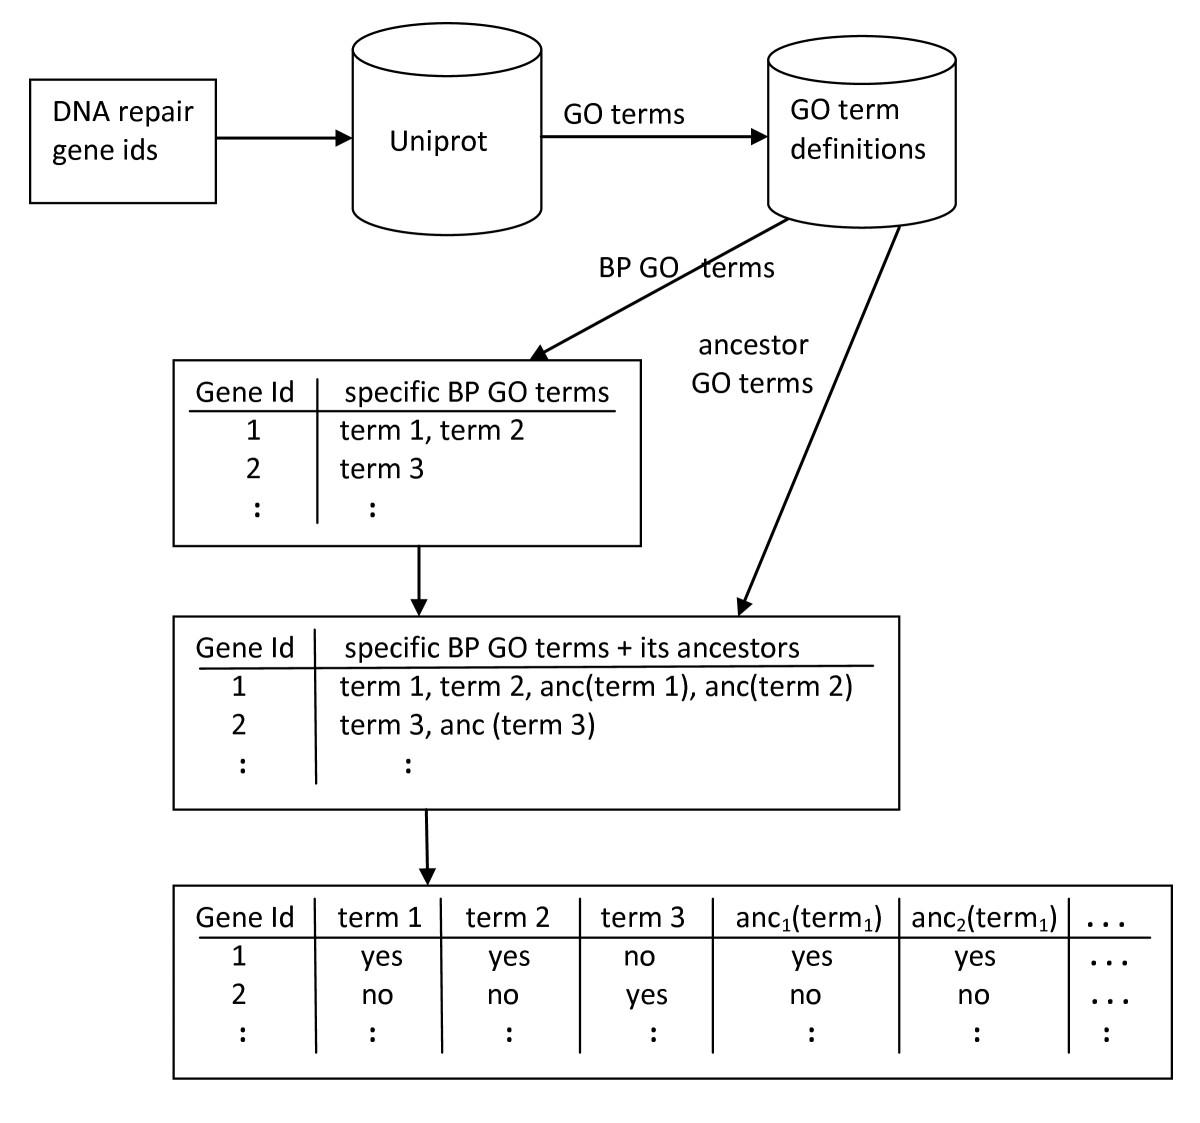 https://static-content.springer.com/image/art%3A10.1186%2F1471-2164-12-27/MediaObjects/12864_2010_3166_Fig2_HTML.jpg